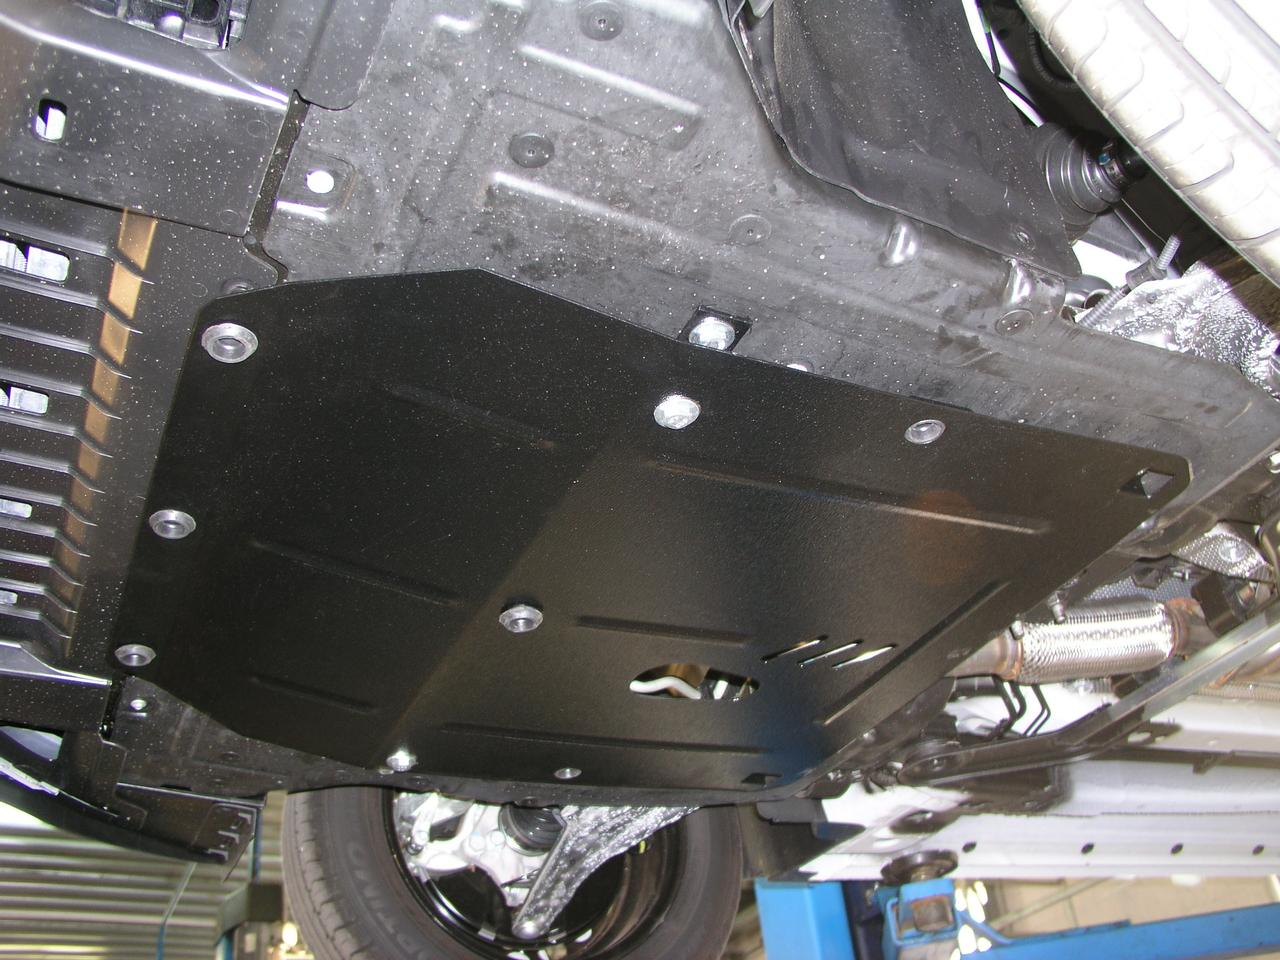 Захист картера двигуна) і Коробки передач на Chrysler PT Cruiser (2000-2010)